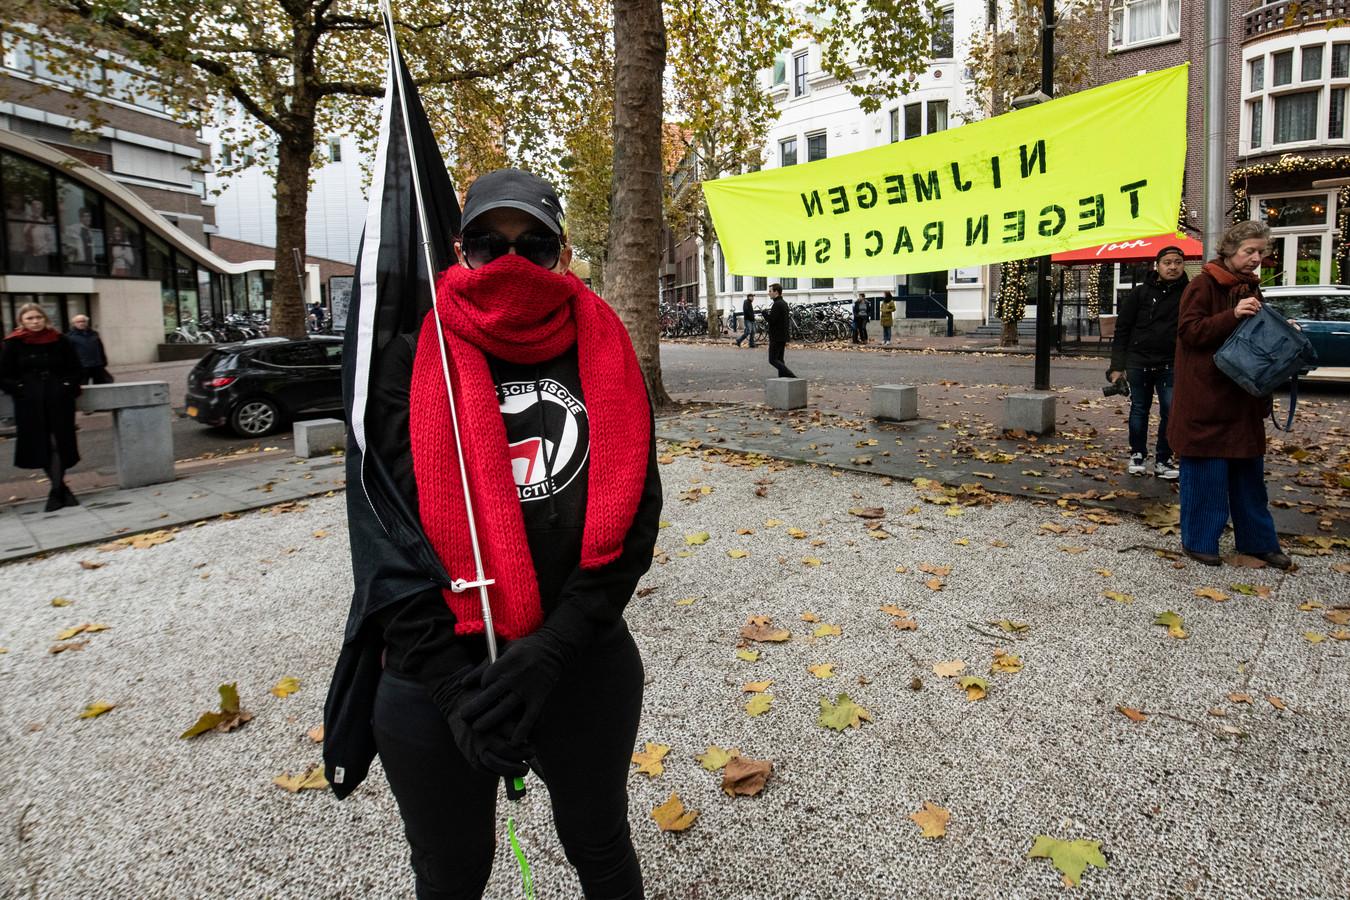 Manifestatie tegen fascisme en racisme op het Faberplein, november vorig jaar.